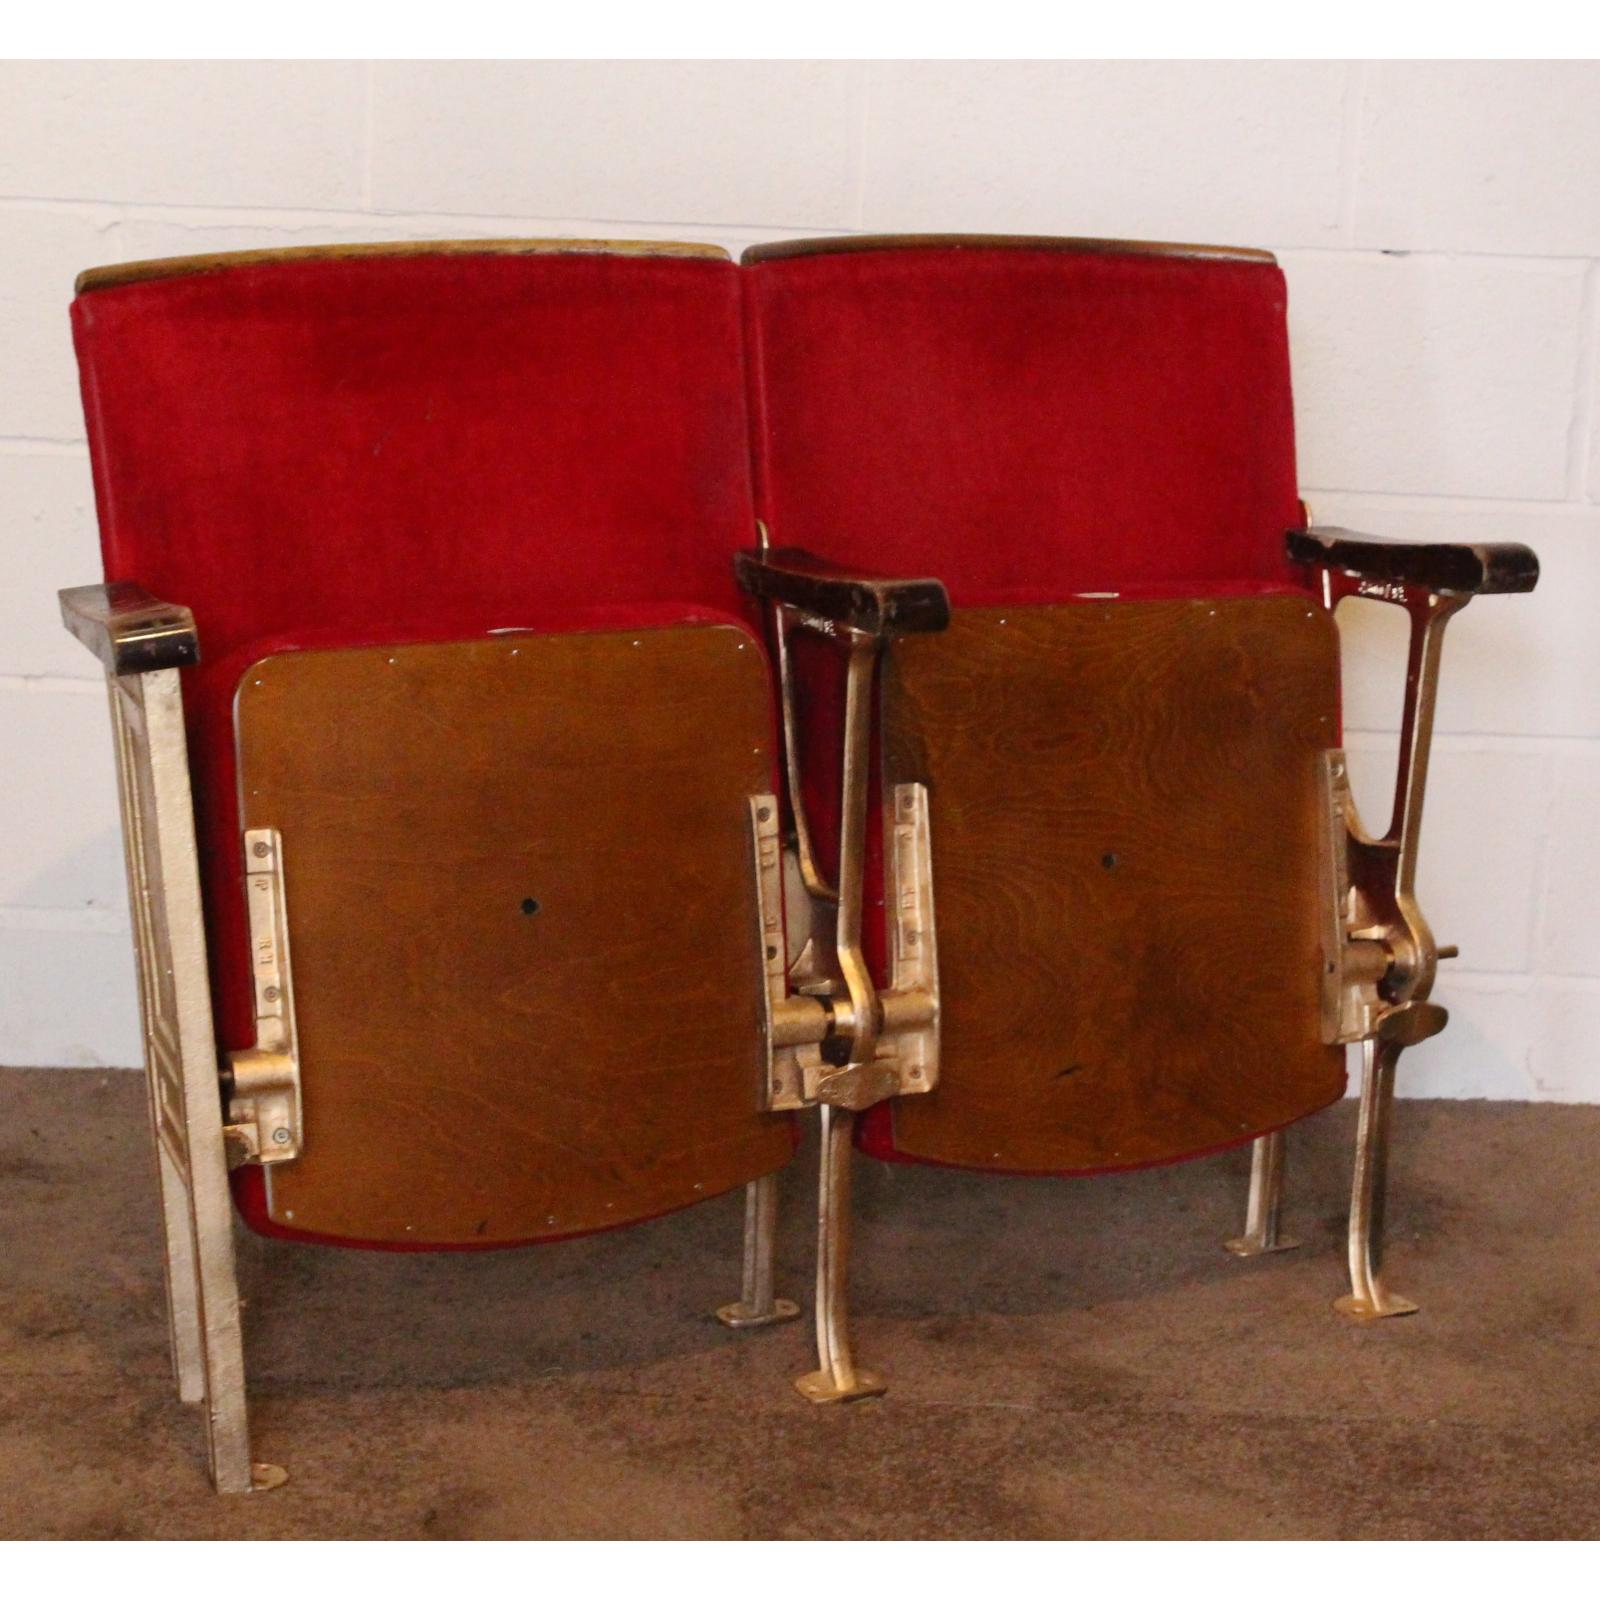 a pair of vintage art deco c1930s cinema theatre seats